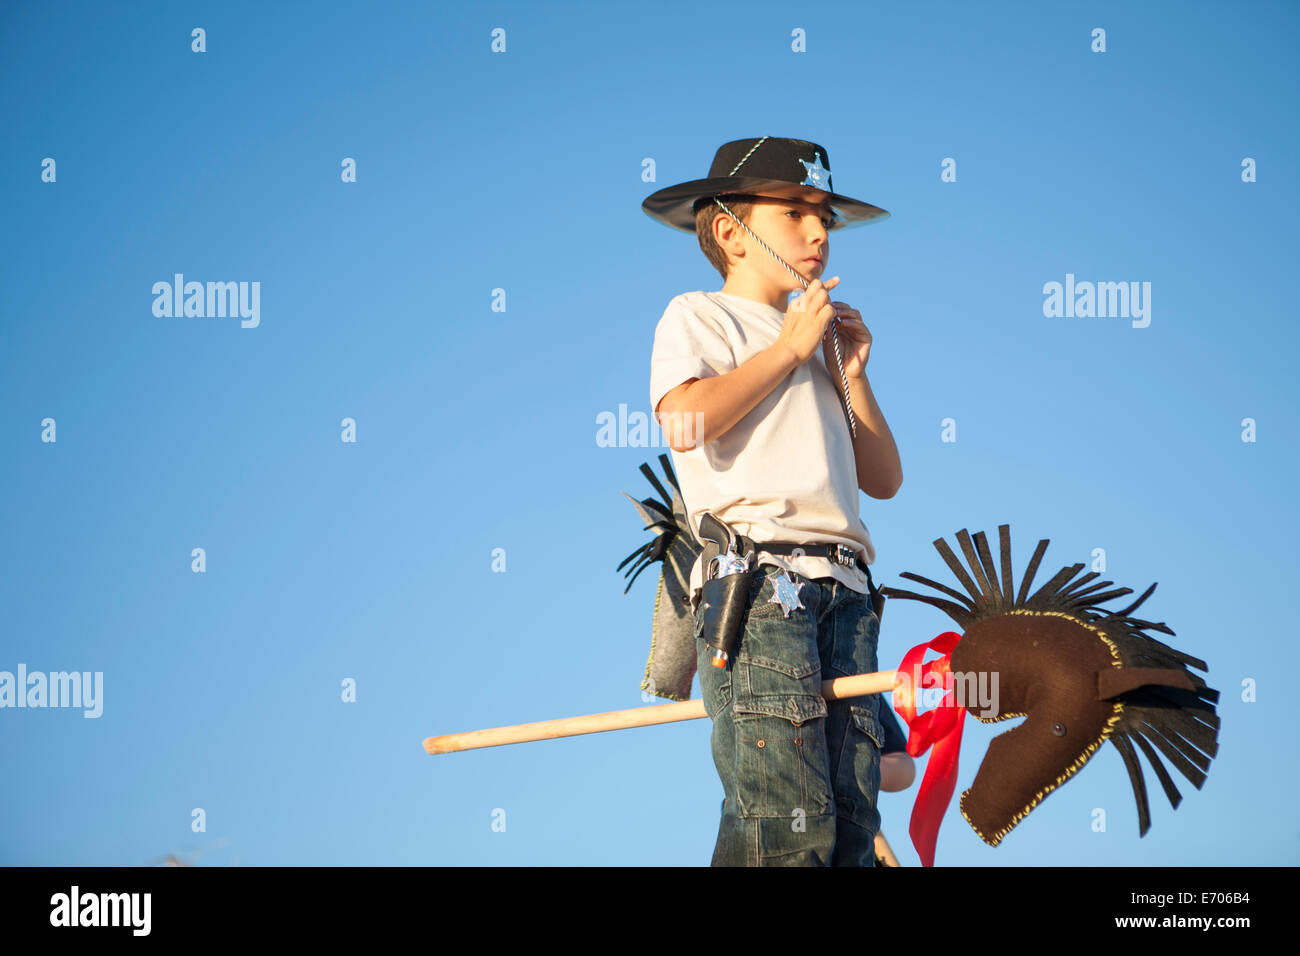 Boy dressed as cowboy fastening hat - Stock Image